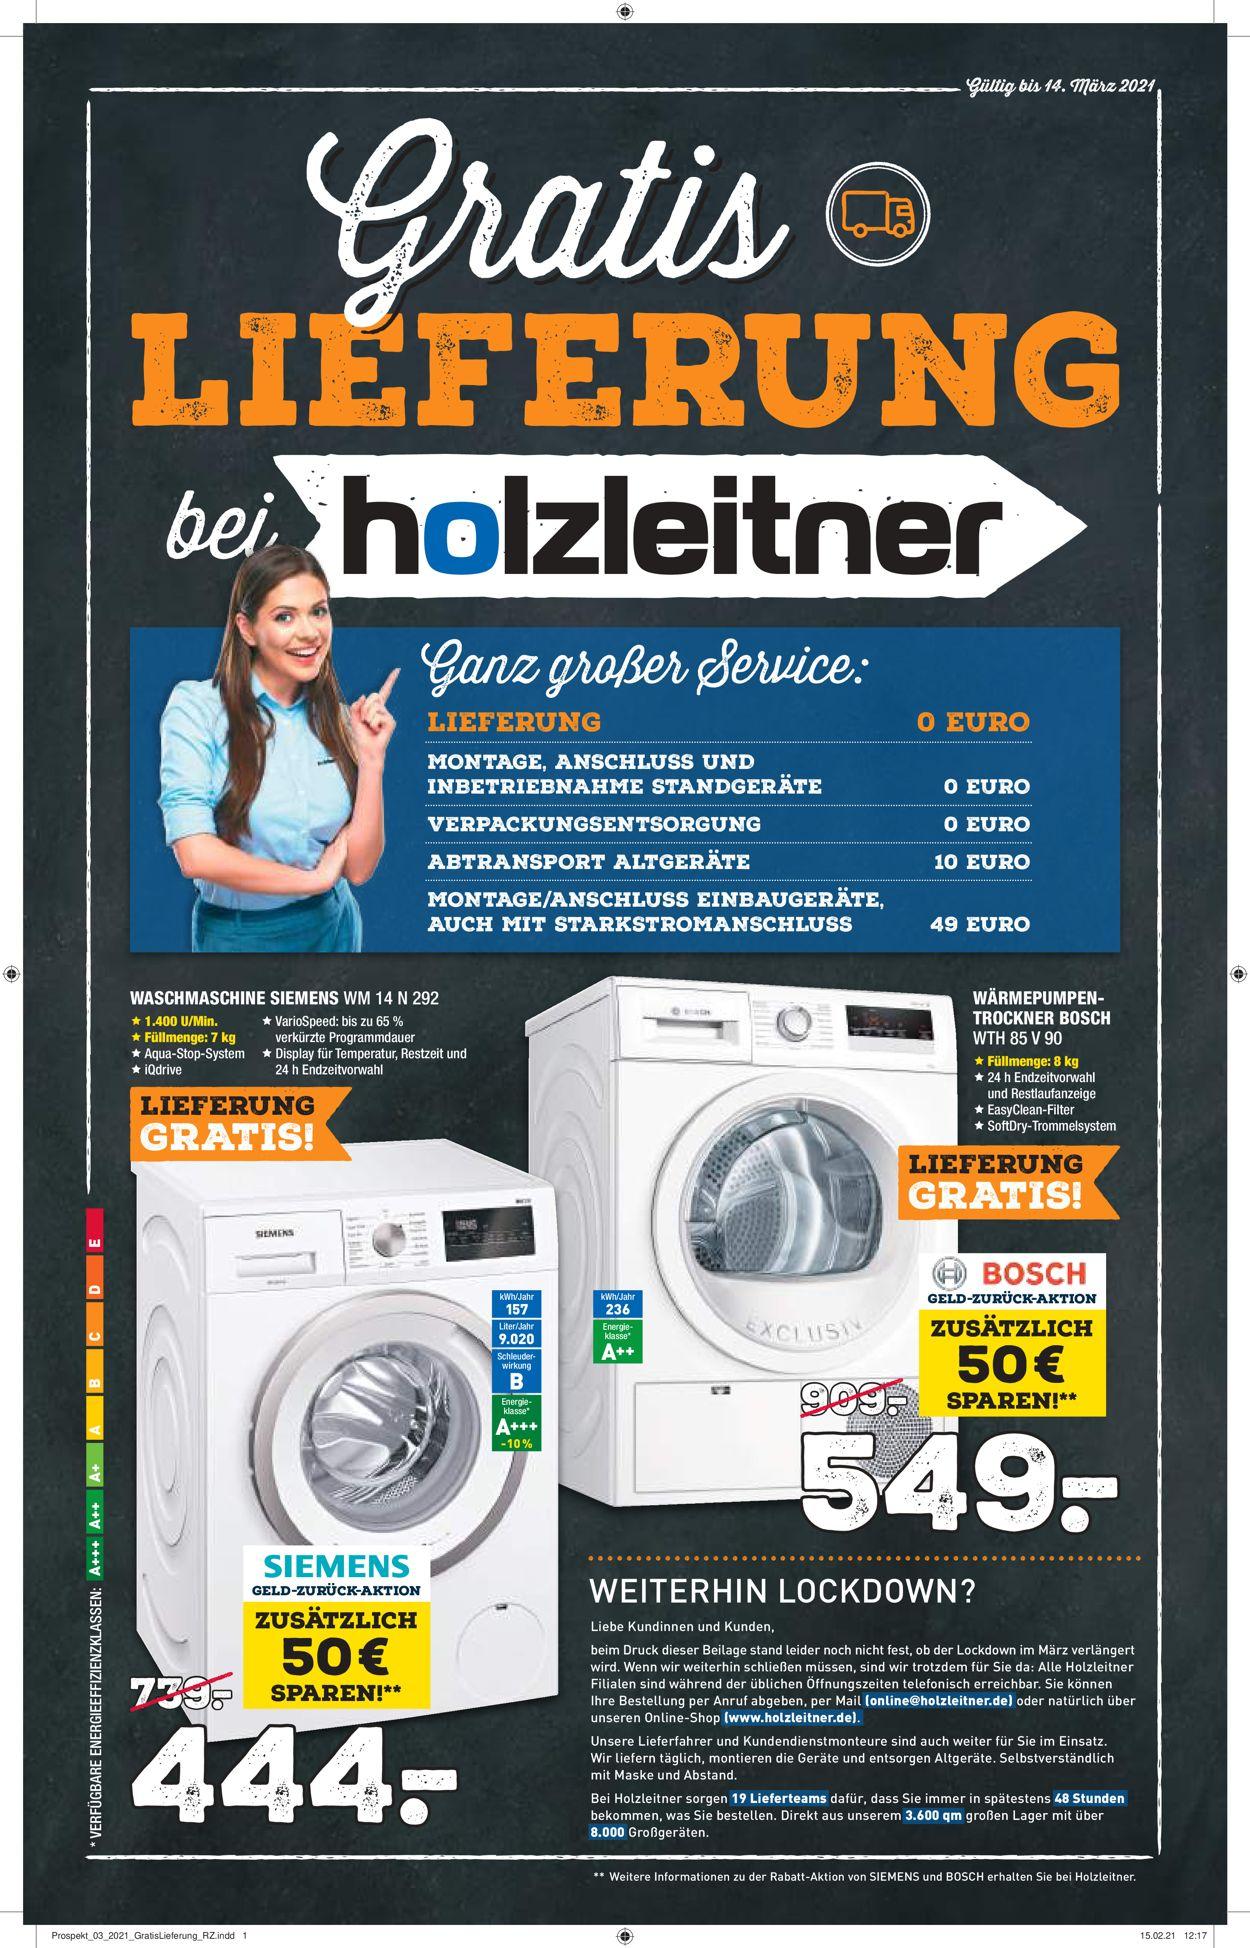 Holzleitner Elektrogeräte Prospekt - Aktuell vom 01.03-14.03.2021